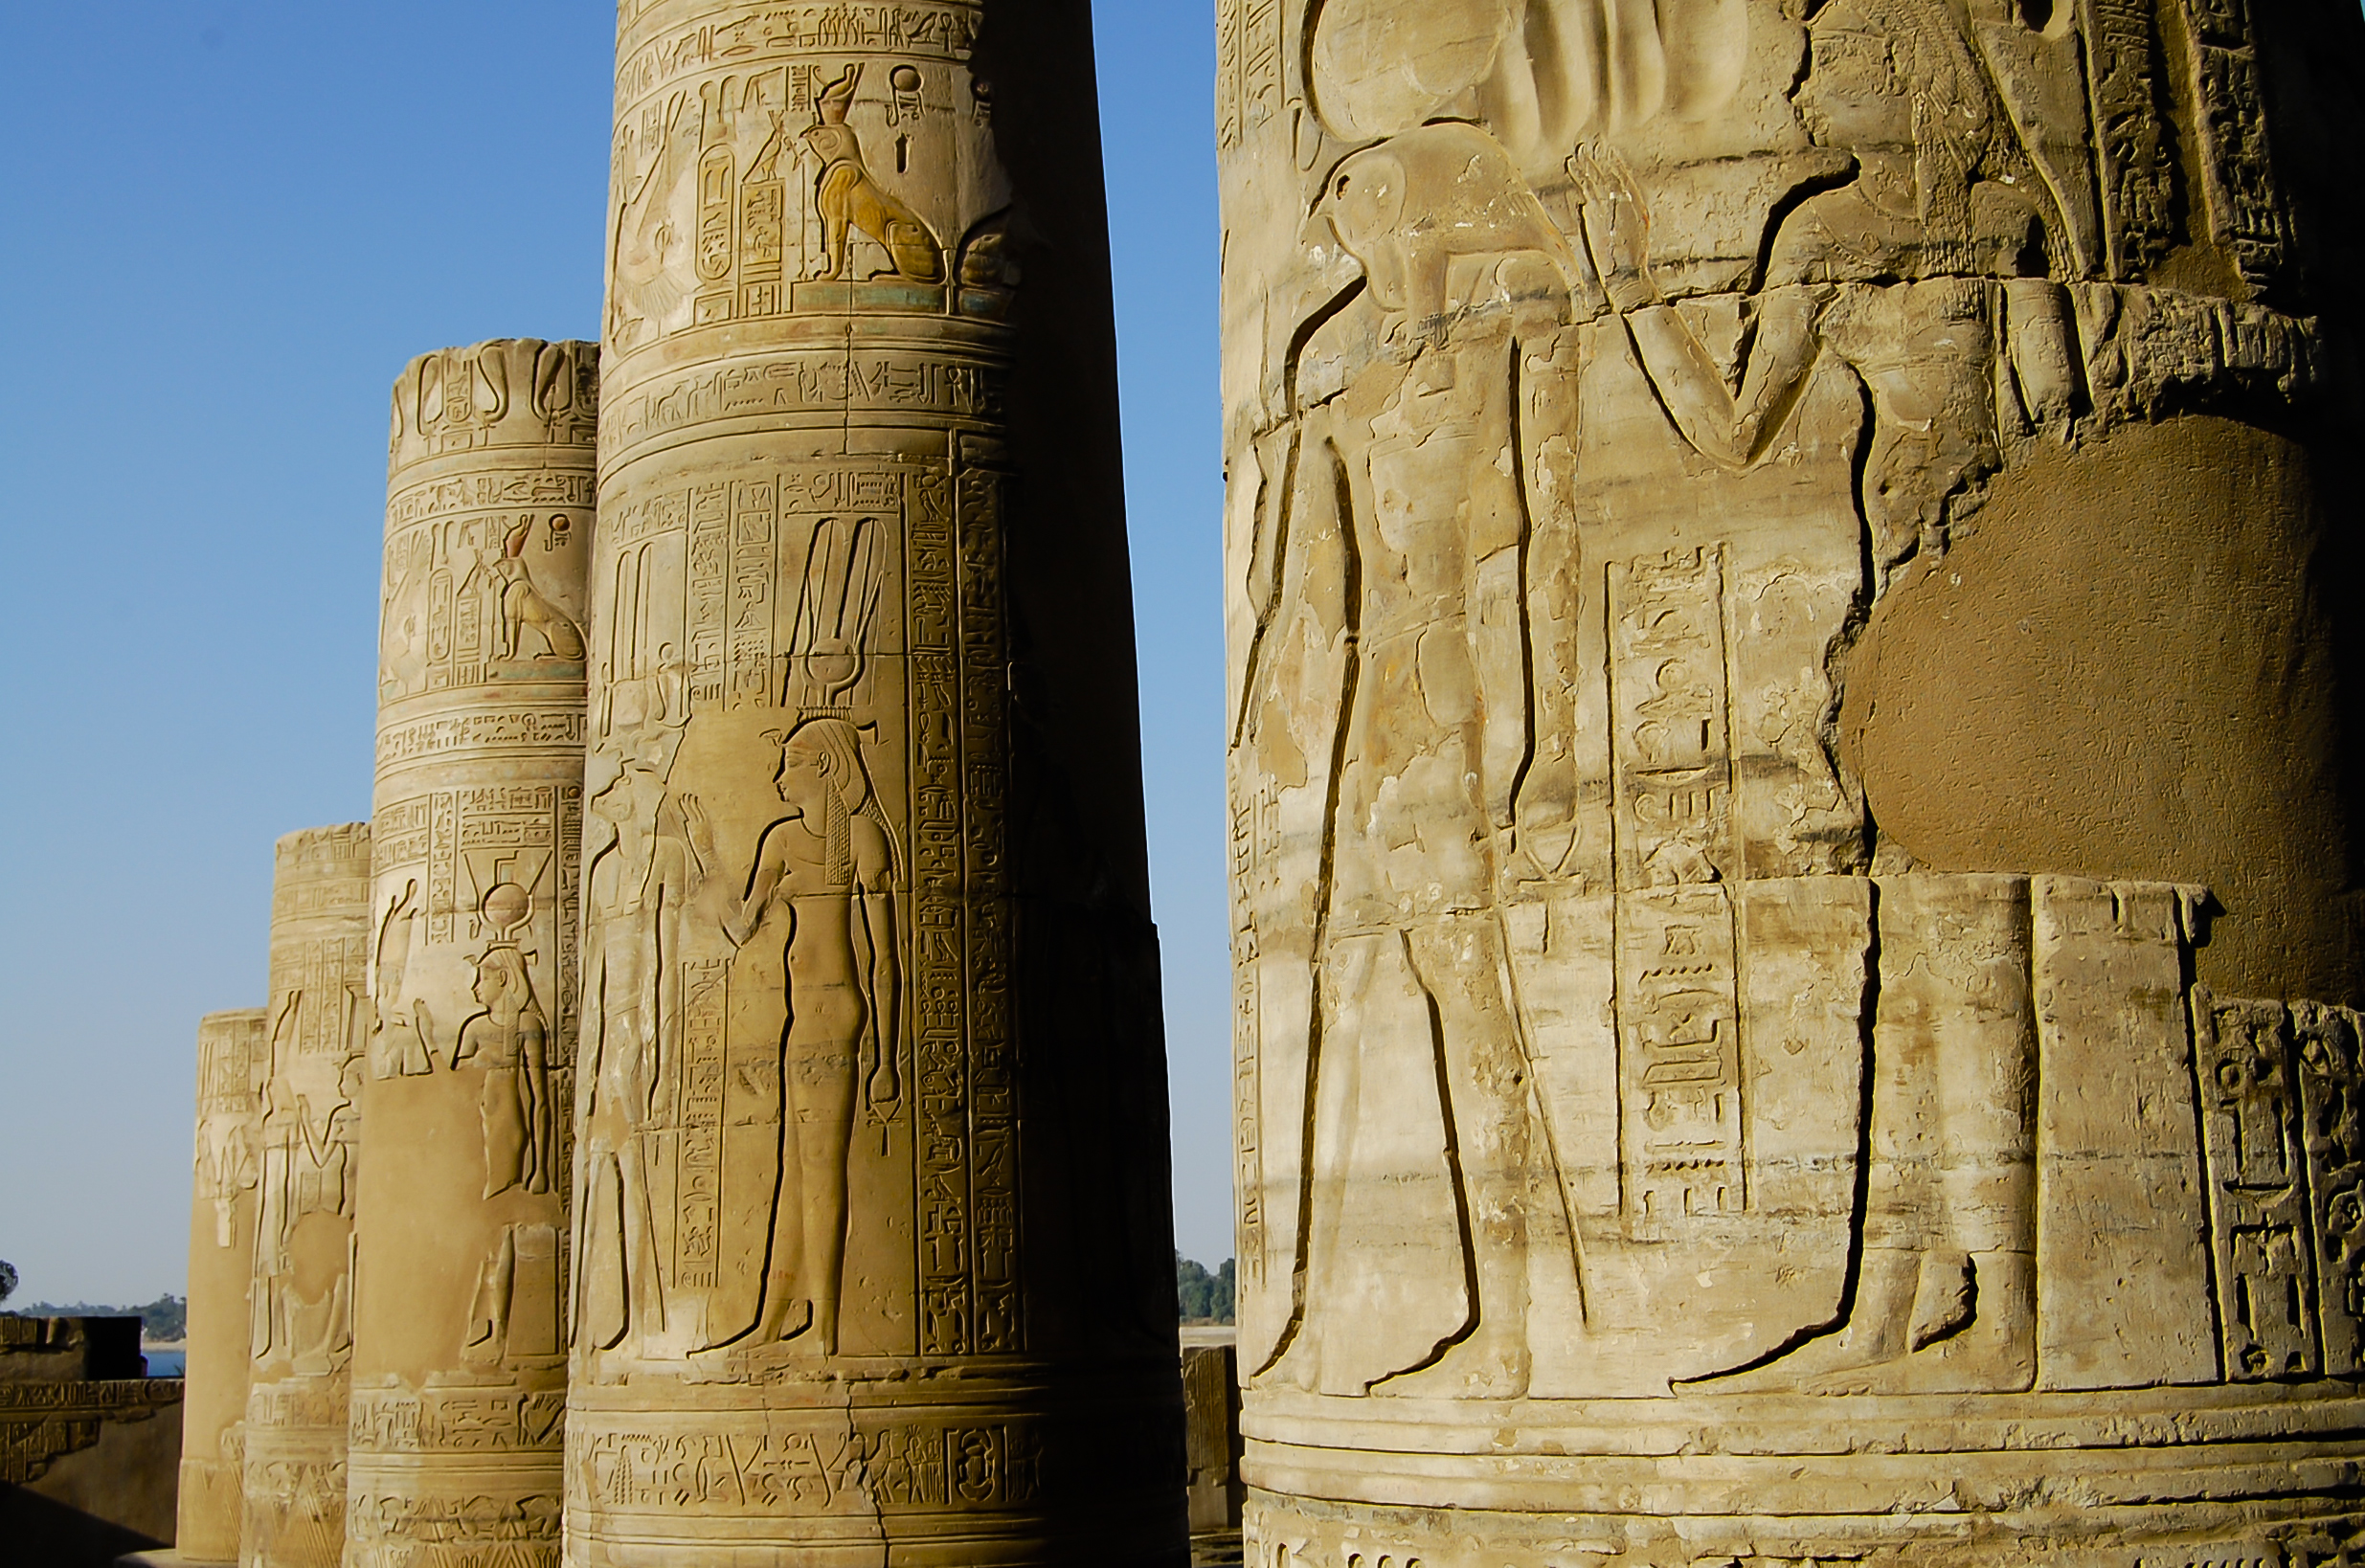 Templo de Kom Ombo en Egipto